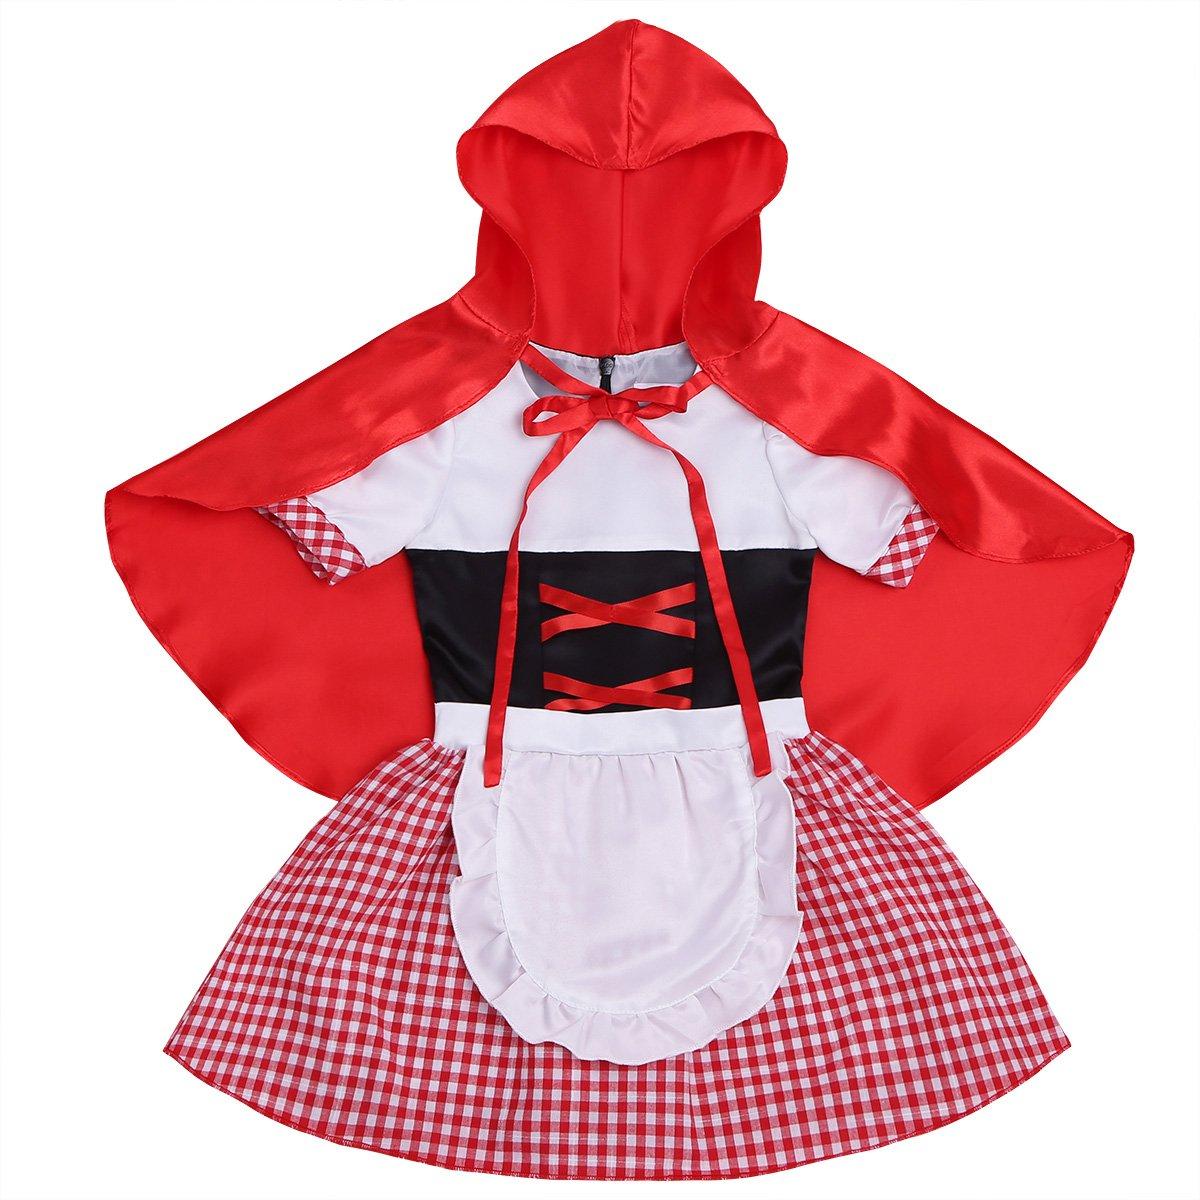 iiniim Baby Girls Halloween Party Costumes Short Sleeves Dress with Hooded Cloak (18-24 Months) by iiniim (Image #3)